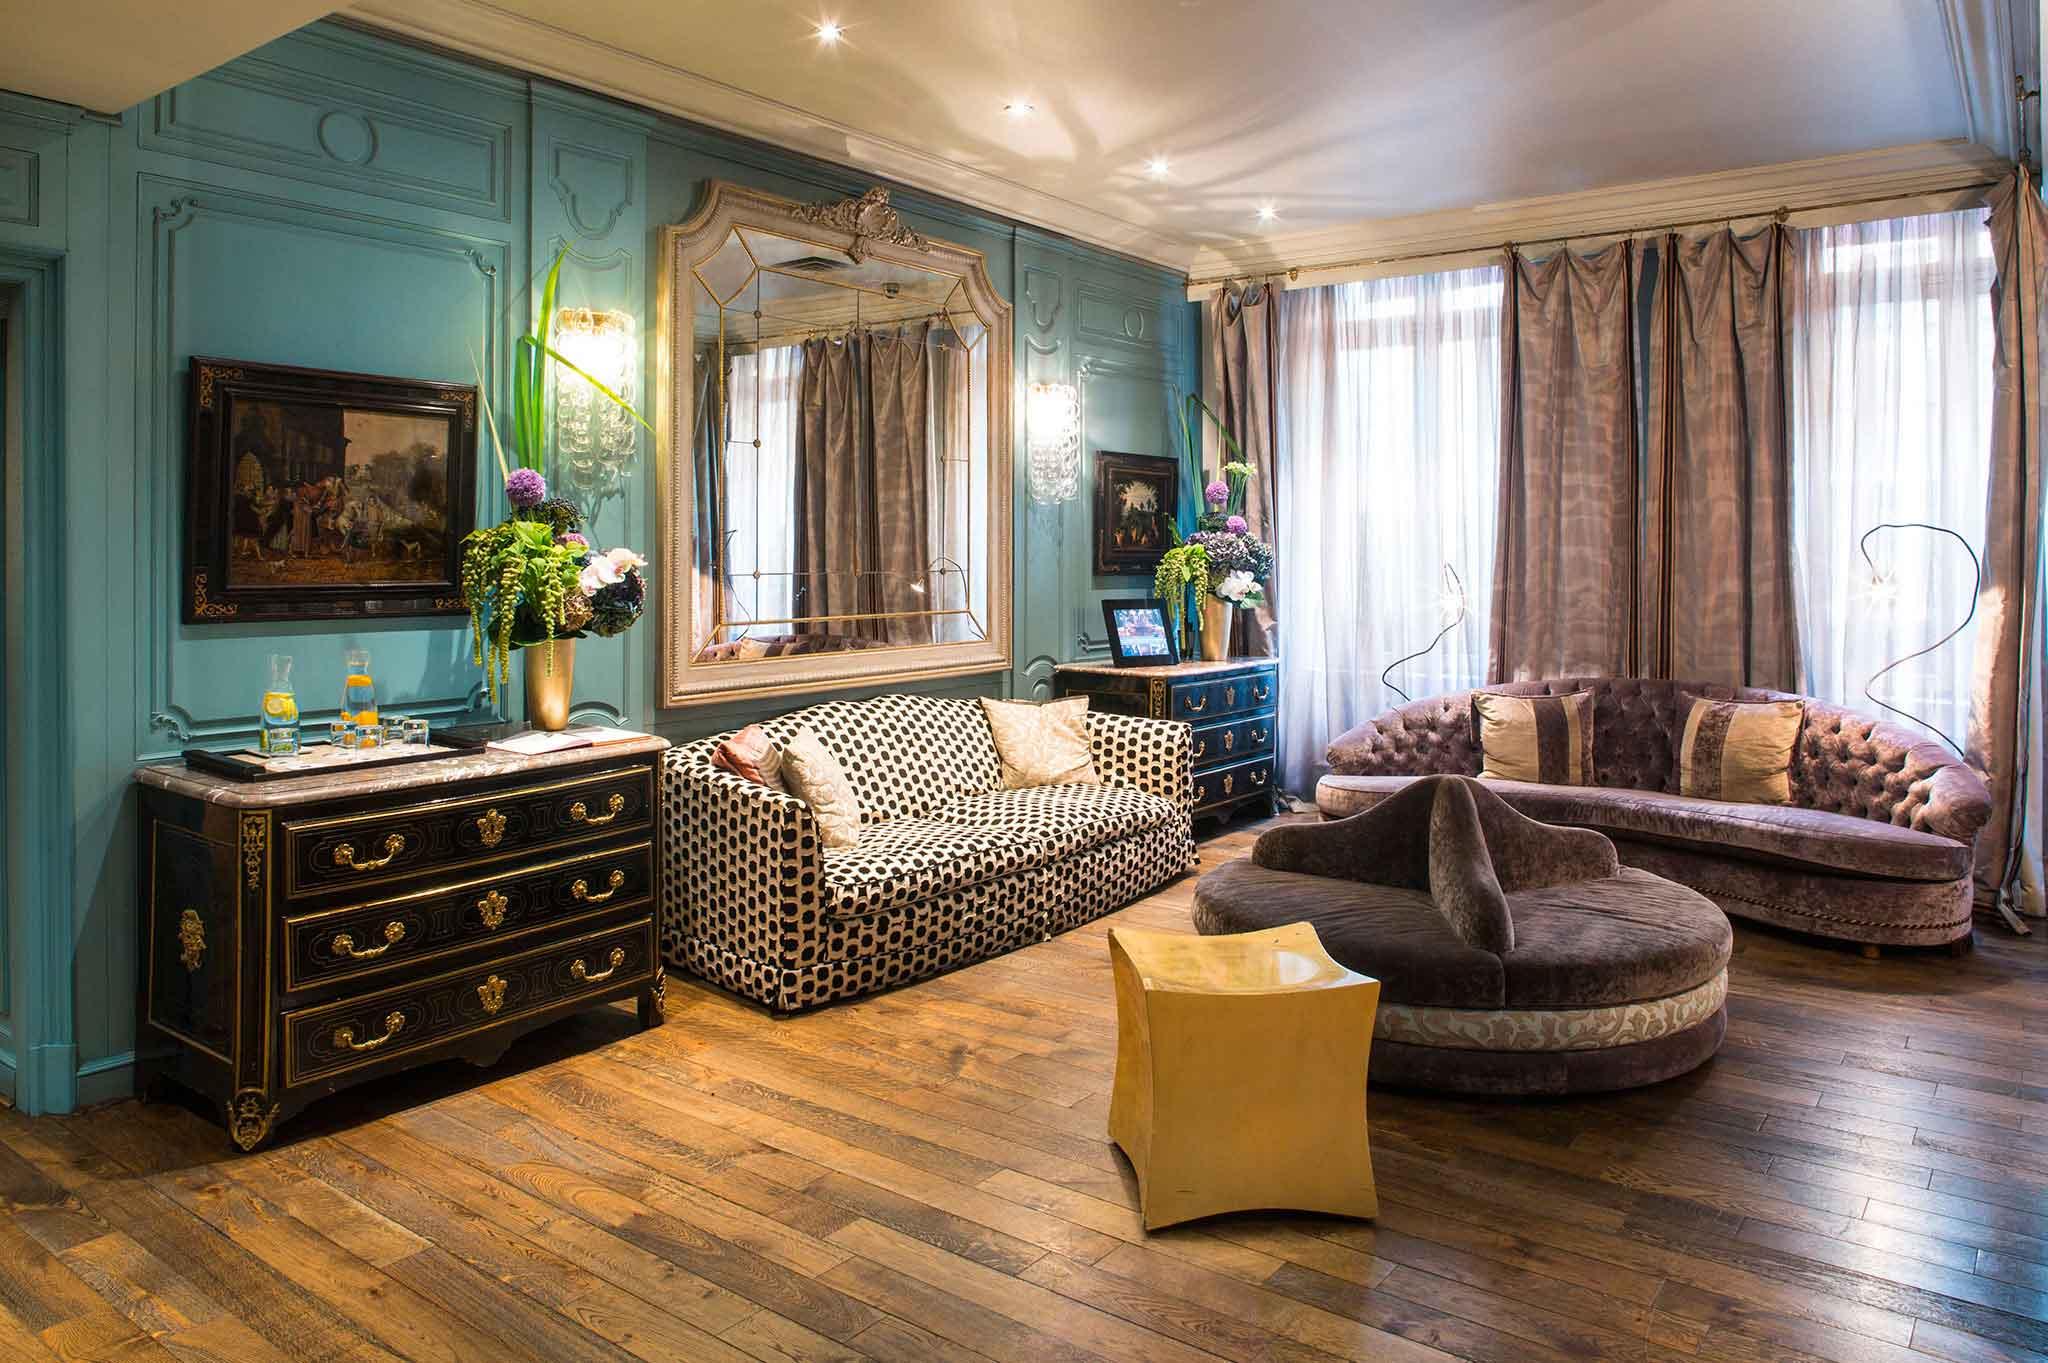 Five-star-hotel-in-central-Paris-Castille-paris-Lobby